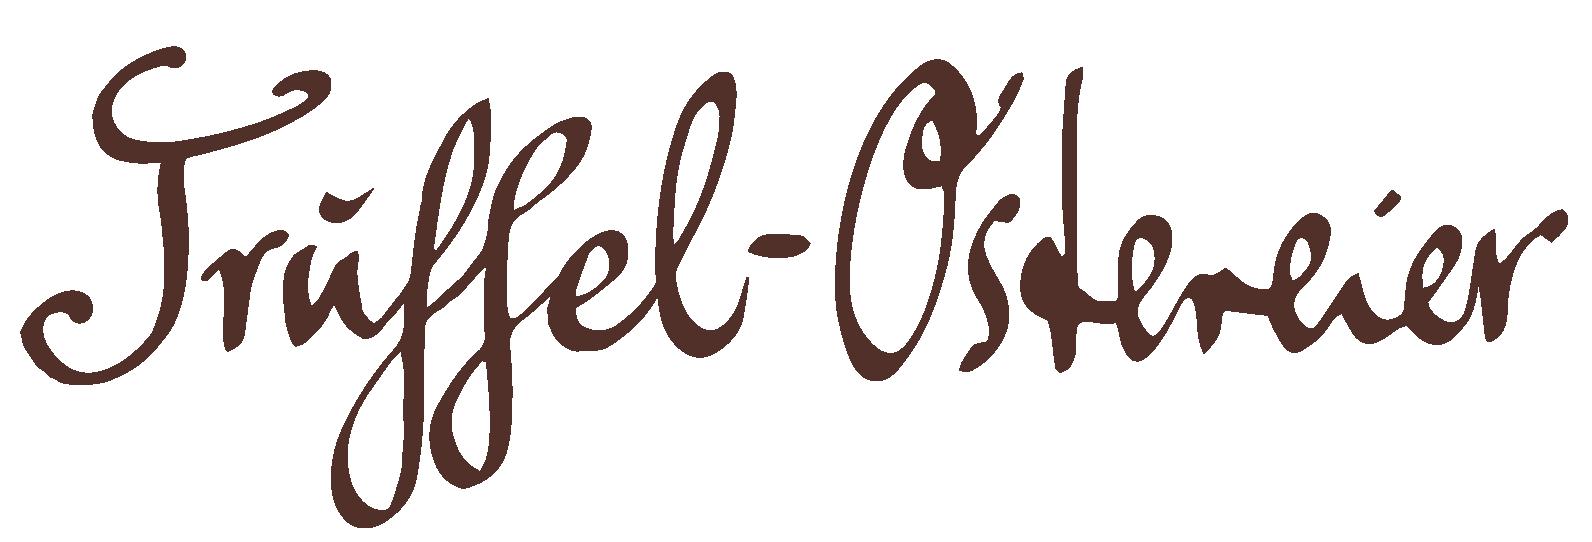 Trüffel-Ostereier Haselnussnougat